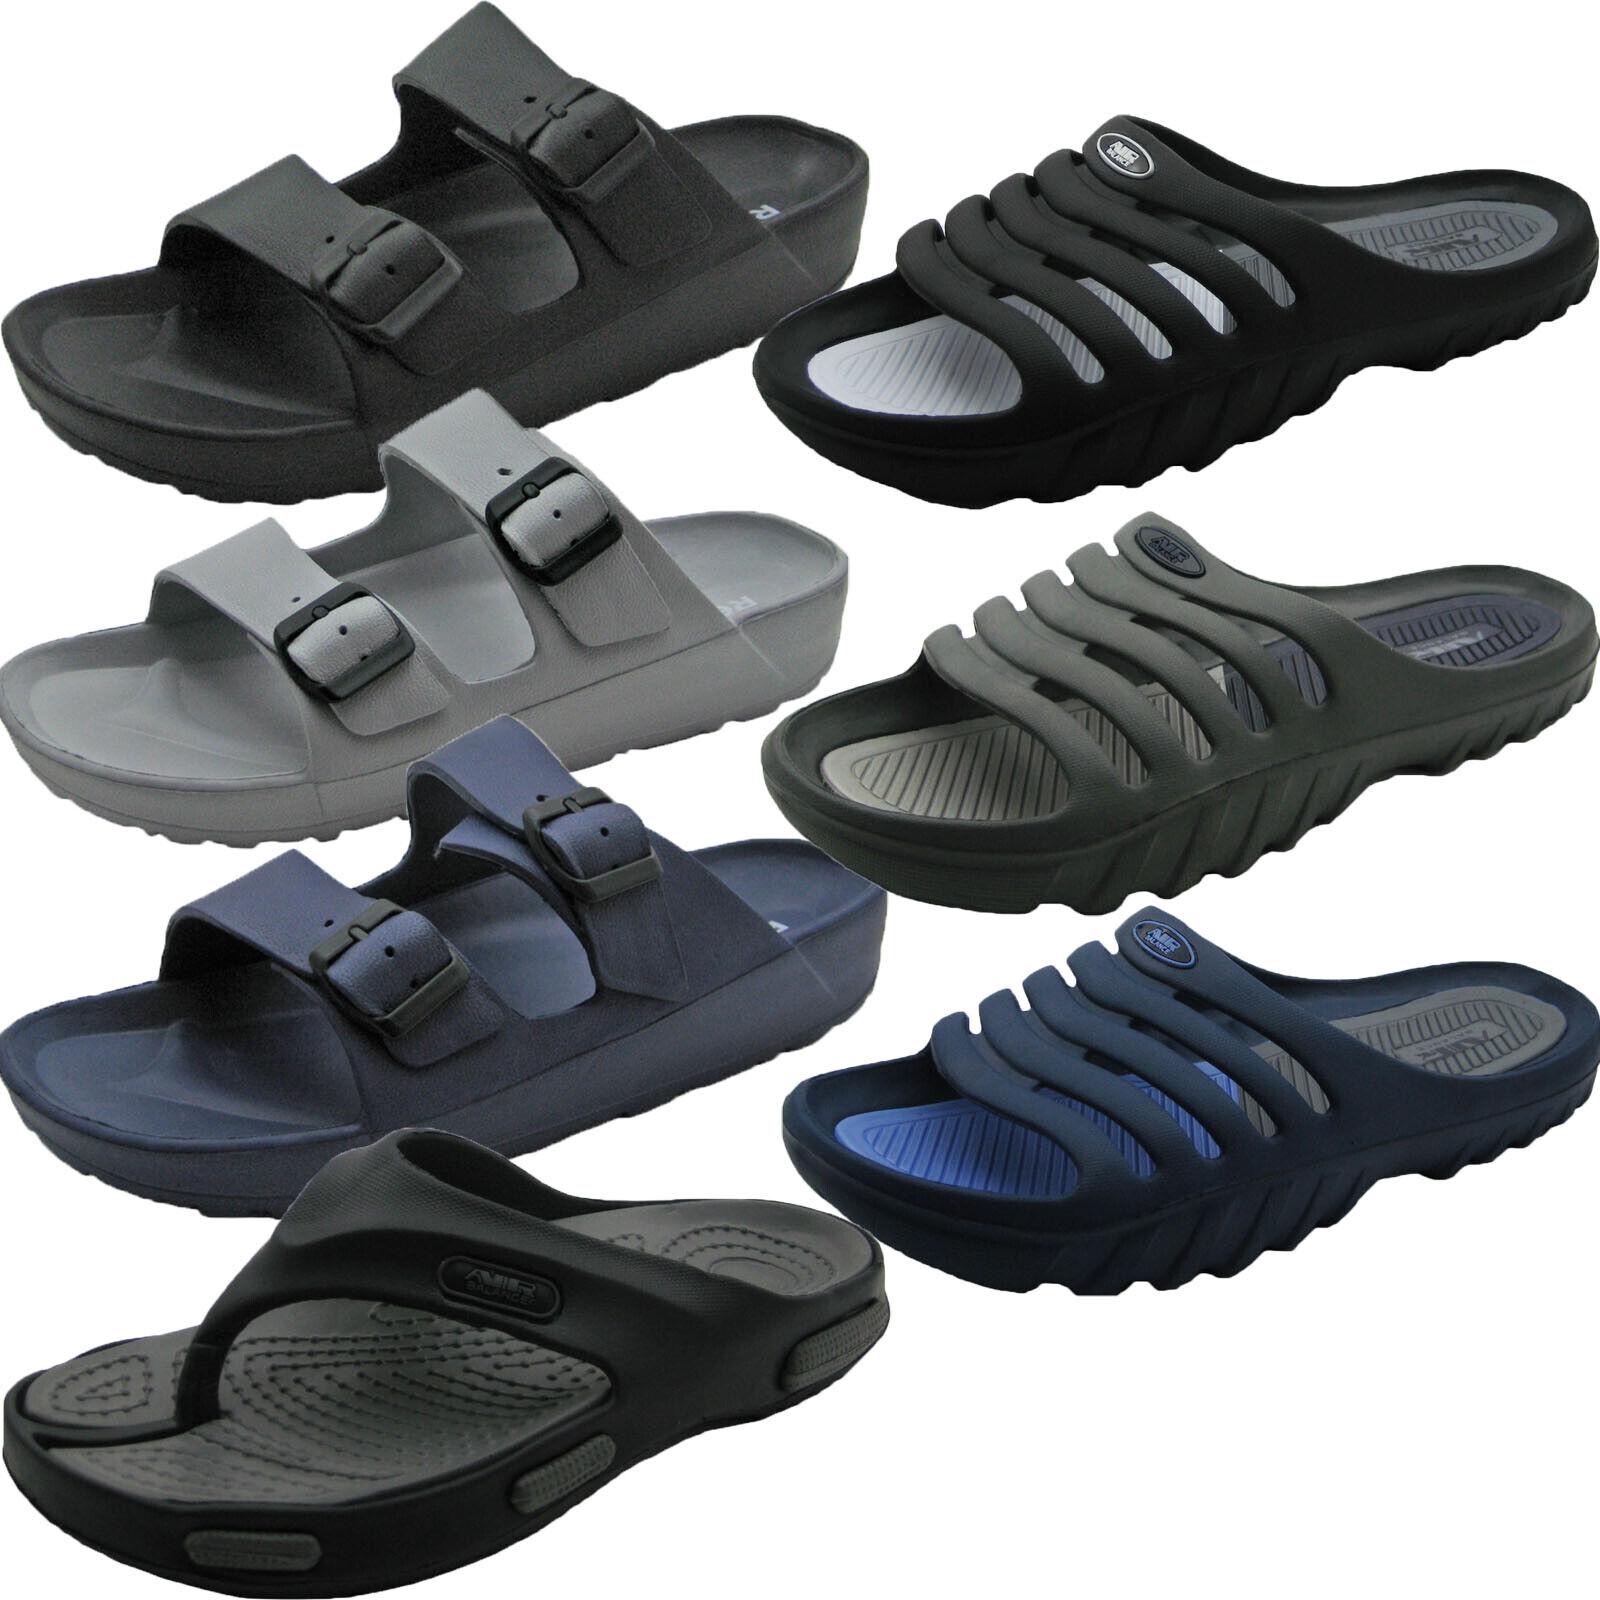 Men's Shower Beach Spa Pool Gym Slippers Sandals